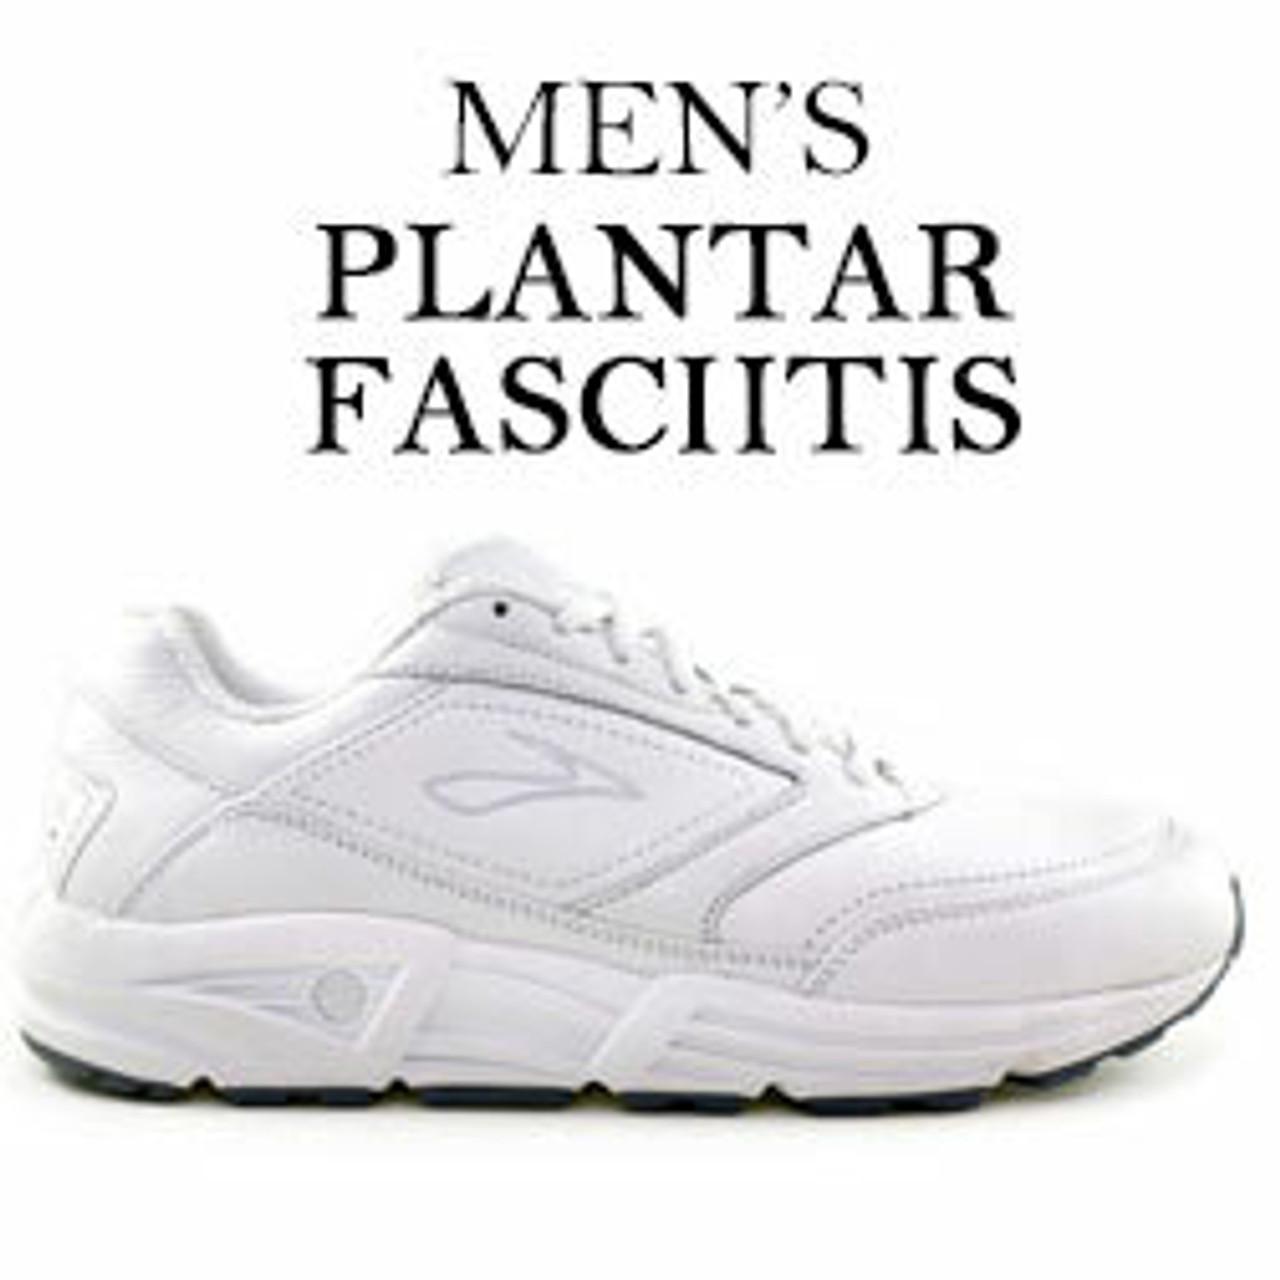 Best Plantar Fasciitis Shoes For Men